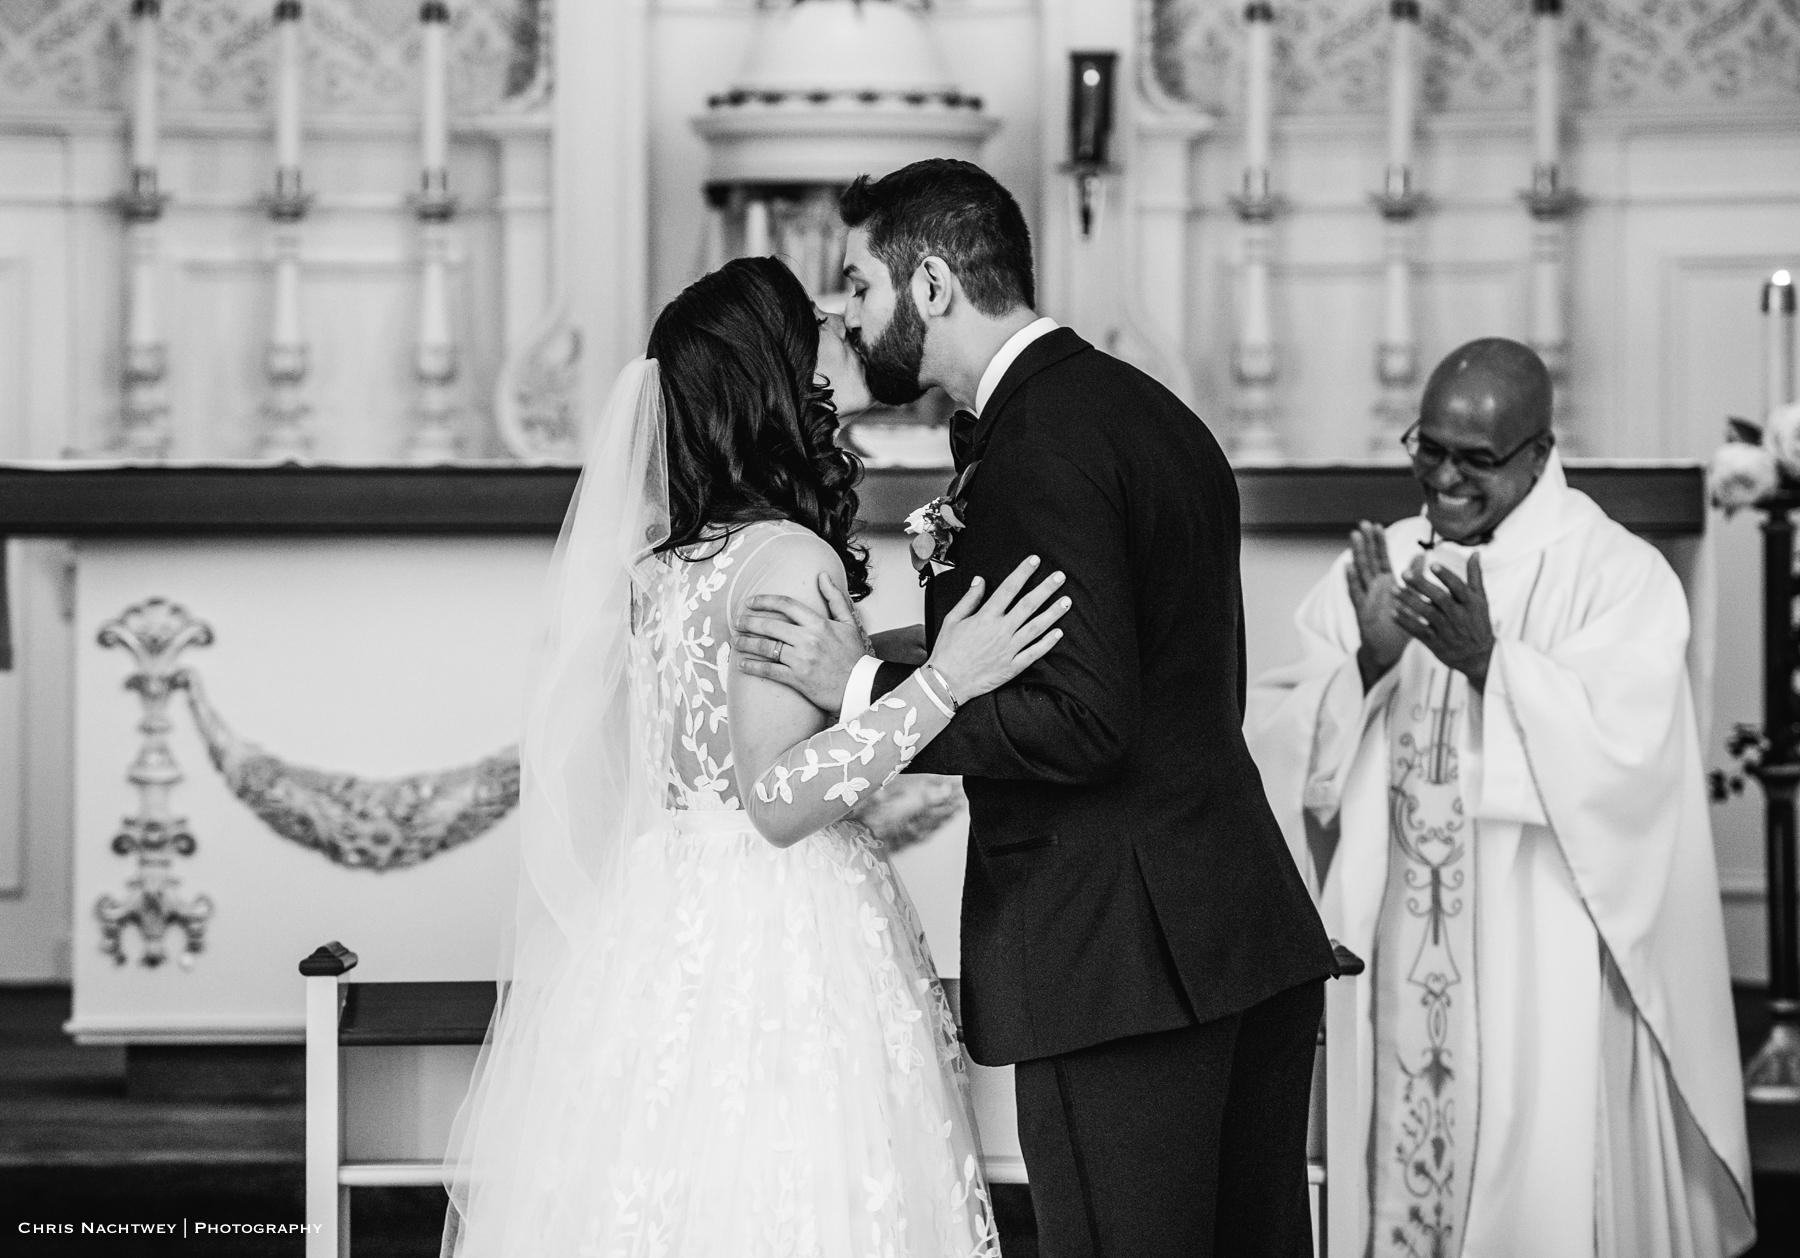 winter-branford-house-wedding-photos-groton-ct-chris-nachtwey-photography-2019-17.jpg